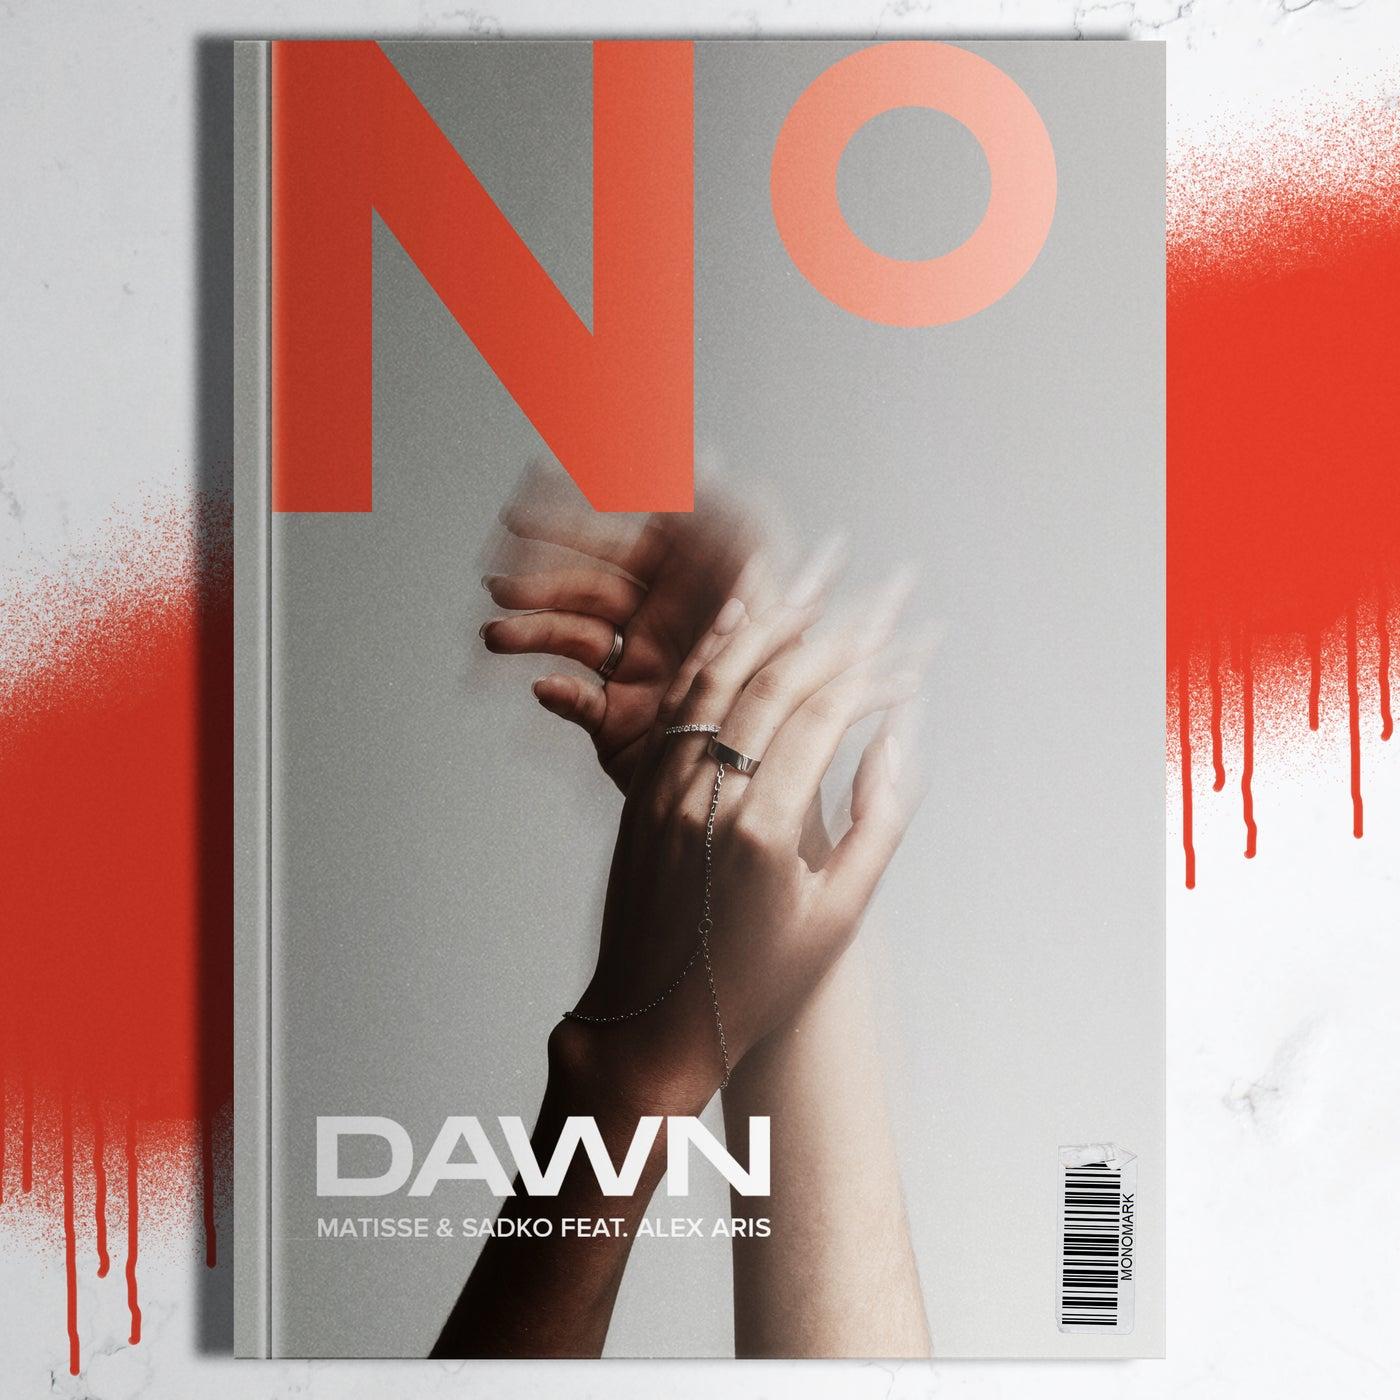 Dawn (Original Mix)